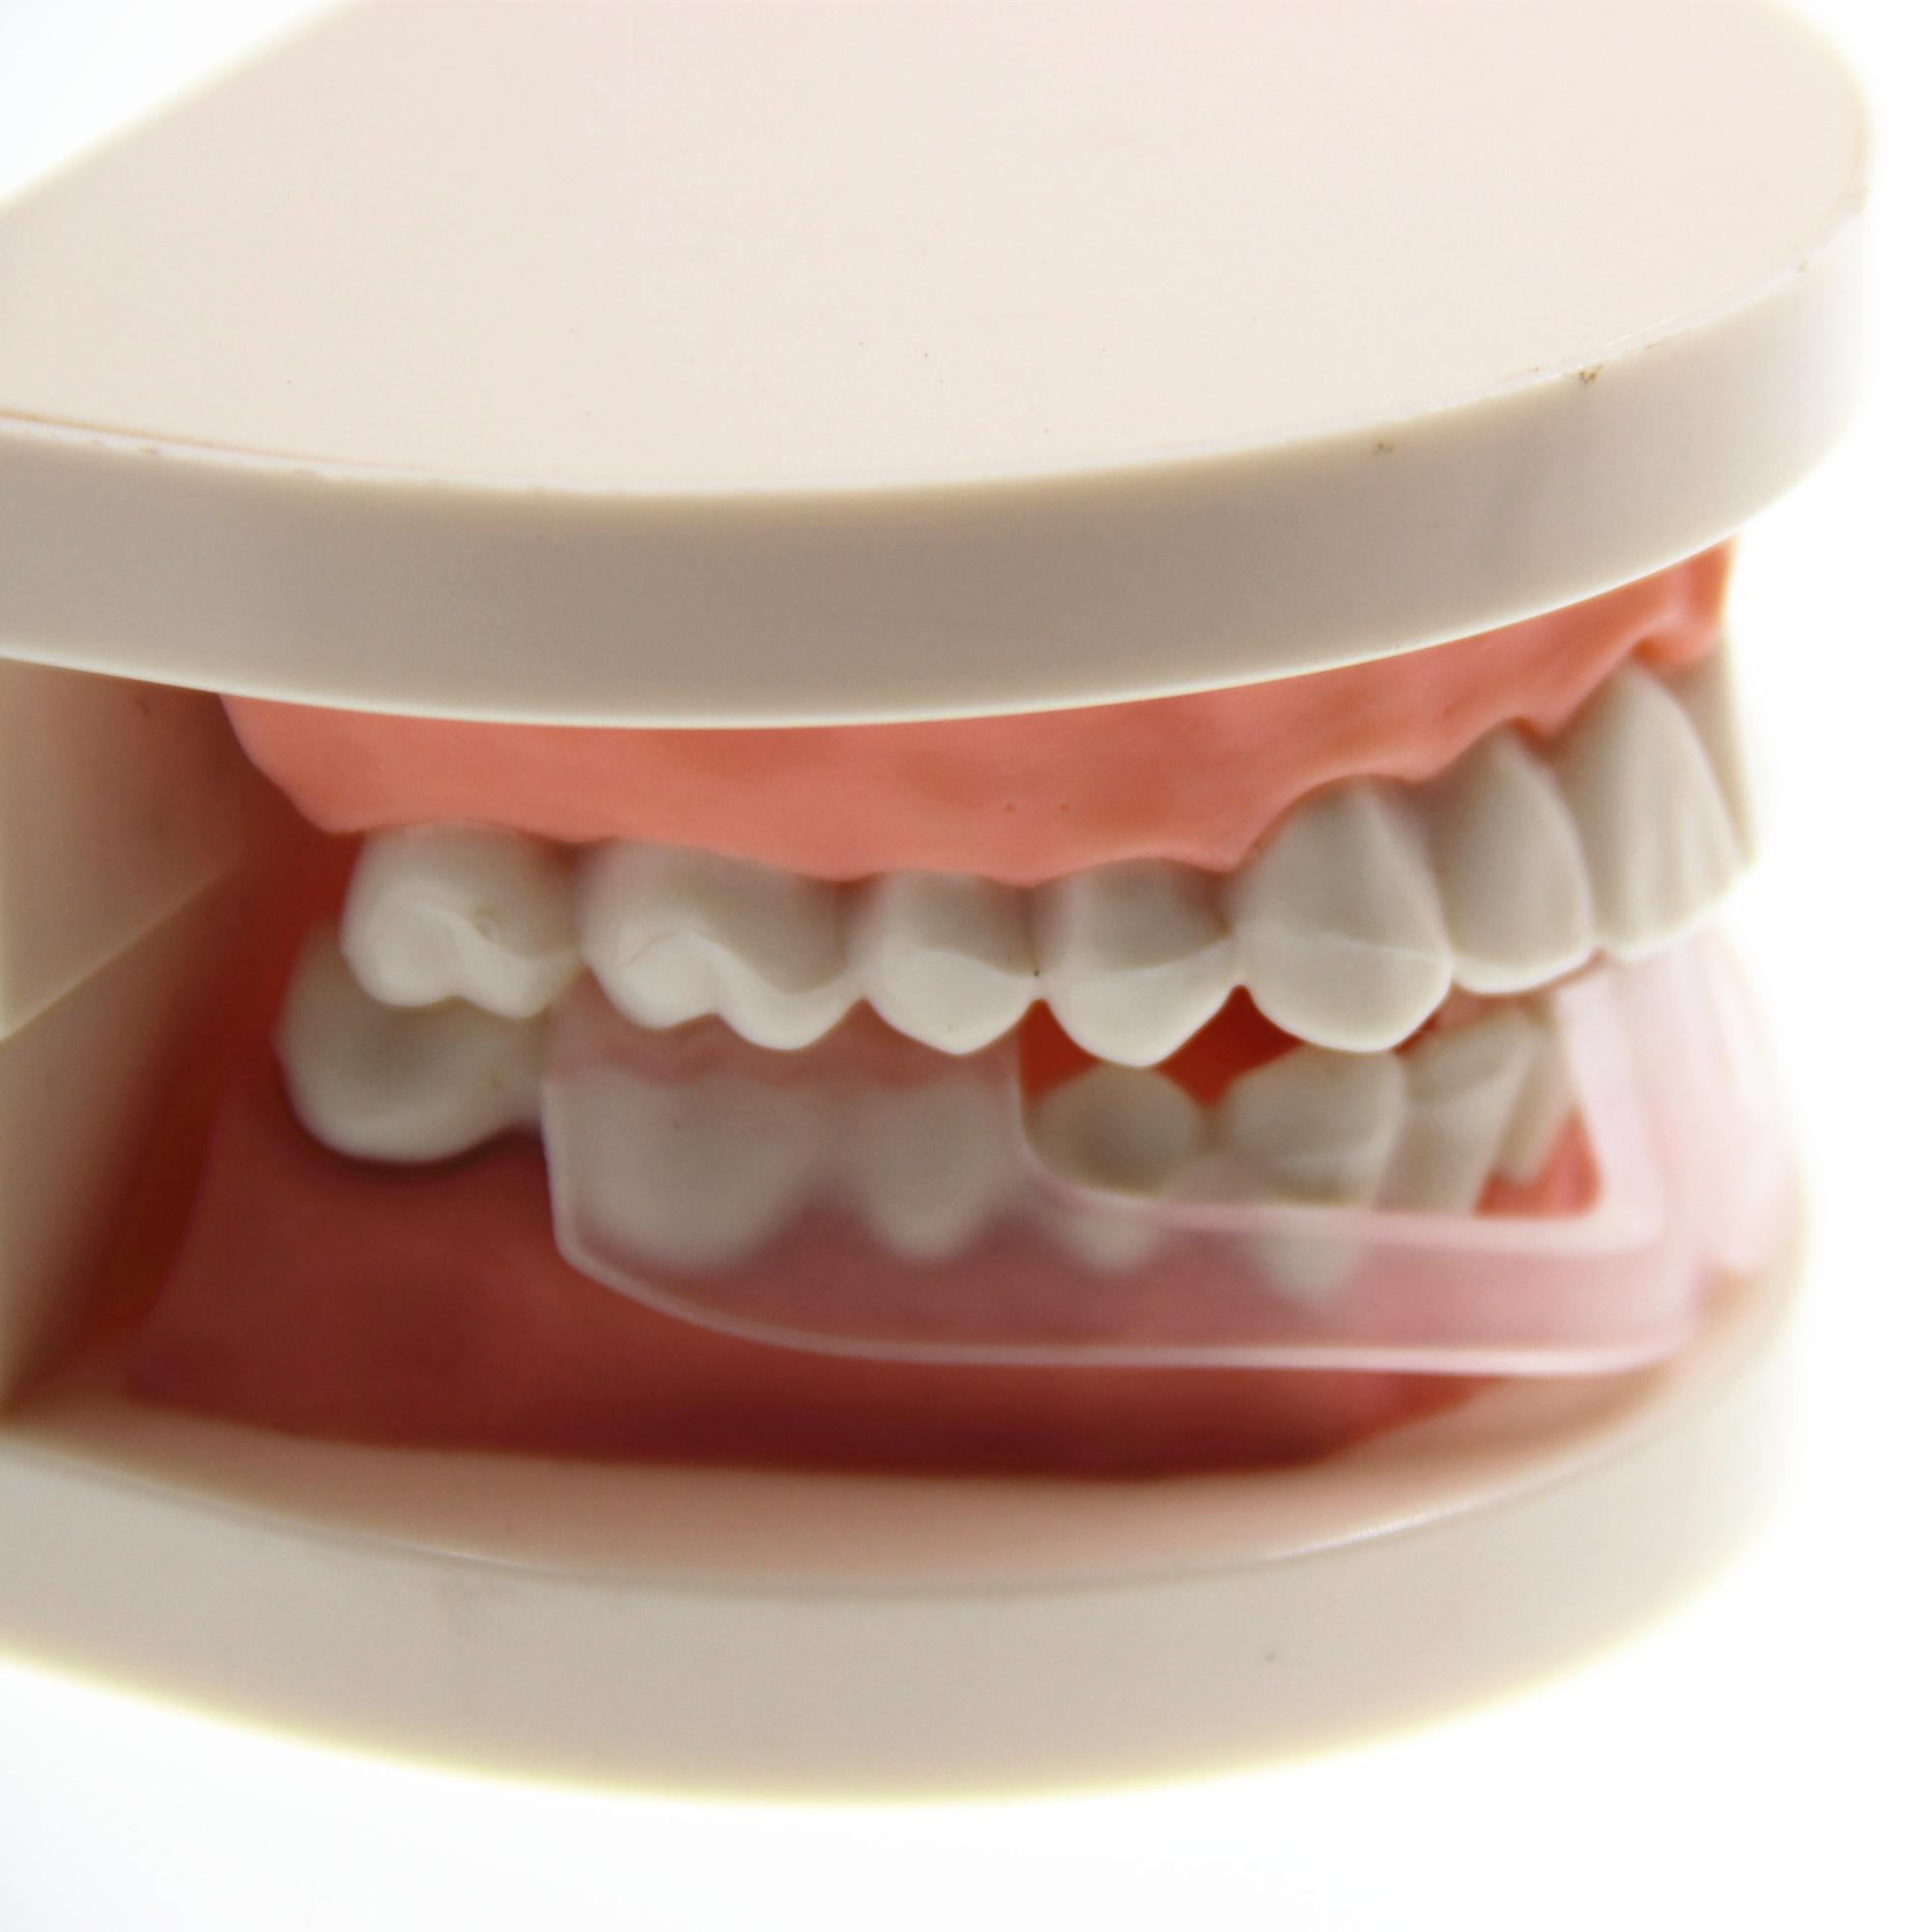 Pro Protetor de Boca Dental Stop Ranger Os Dentes Bruxismo Eliminar Apertamento Sono Ajuda